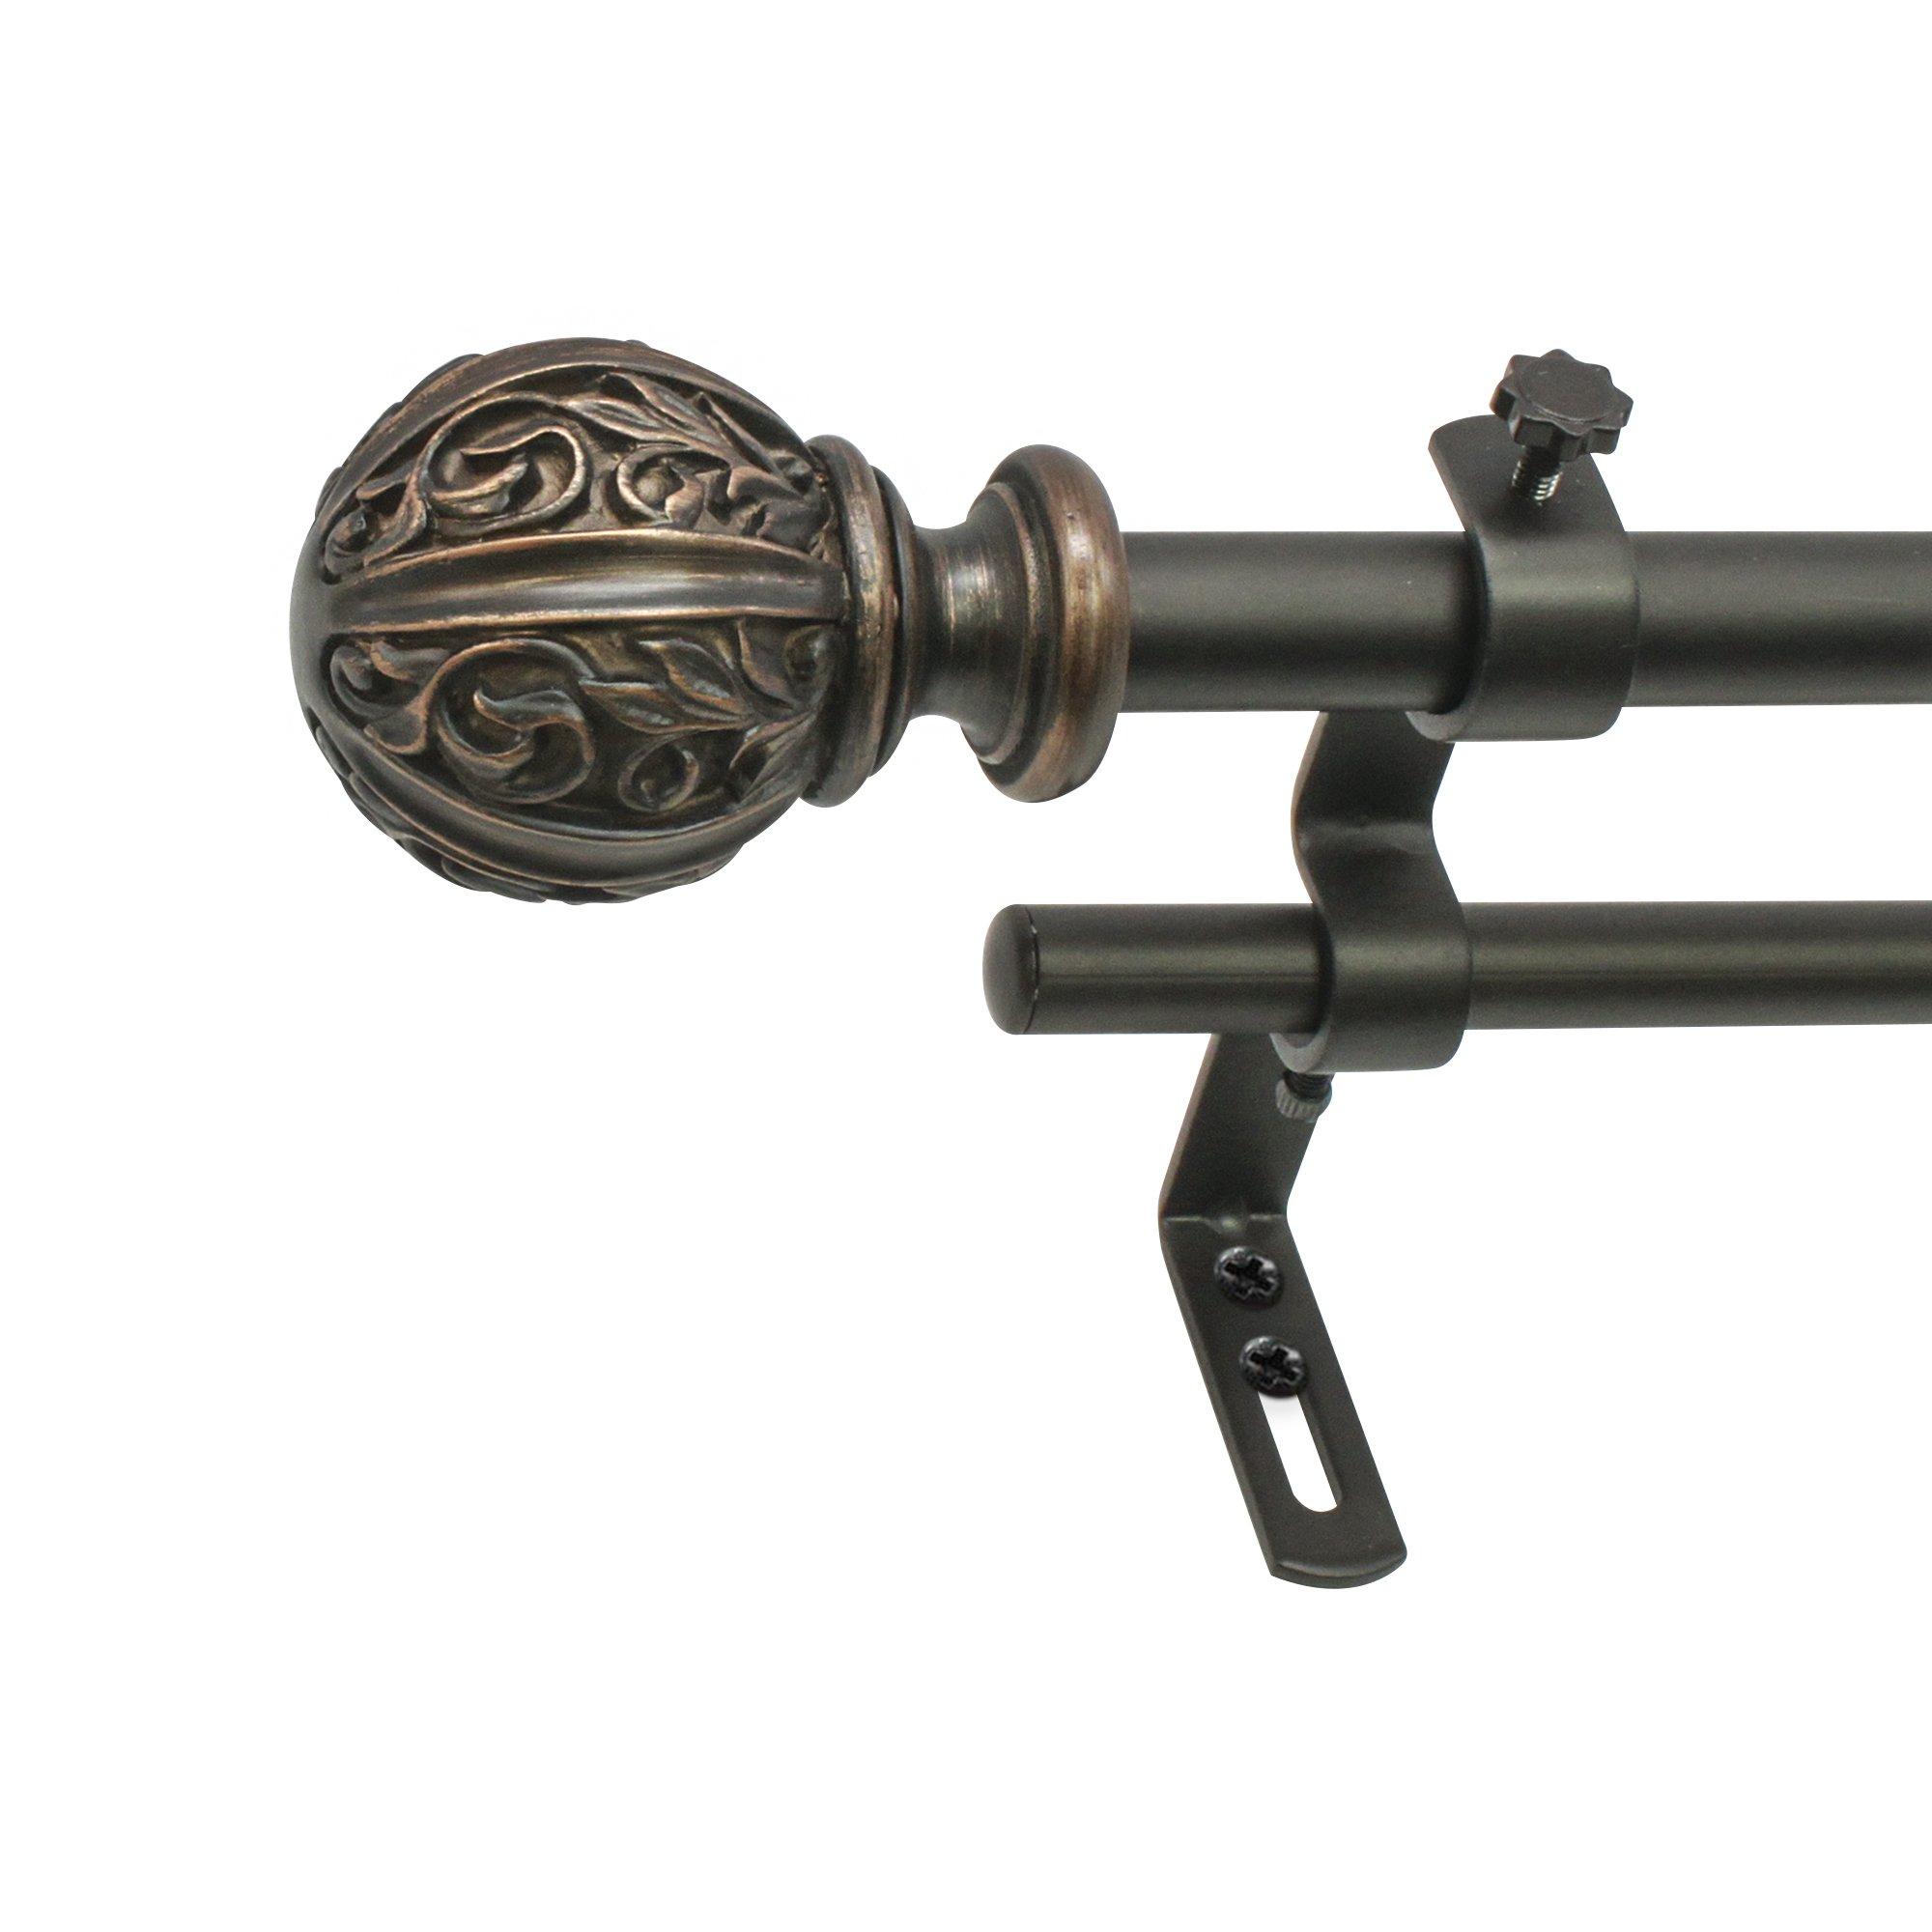 Montevilla Leaf Ball Double Telescoping Drapery Rod, 48-86'', Vintage Bronze by Montevilla